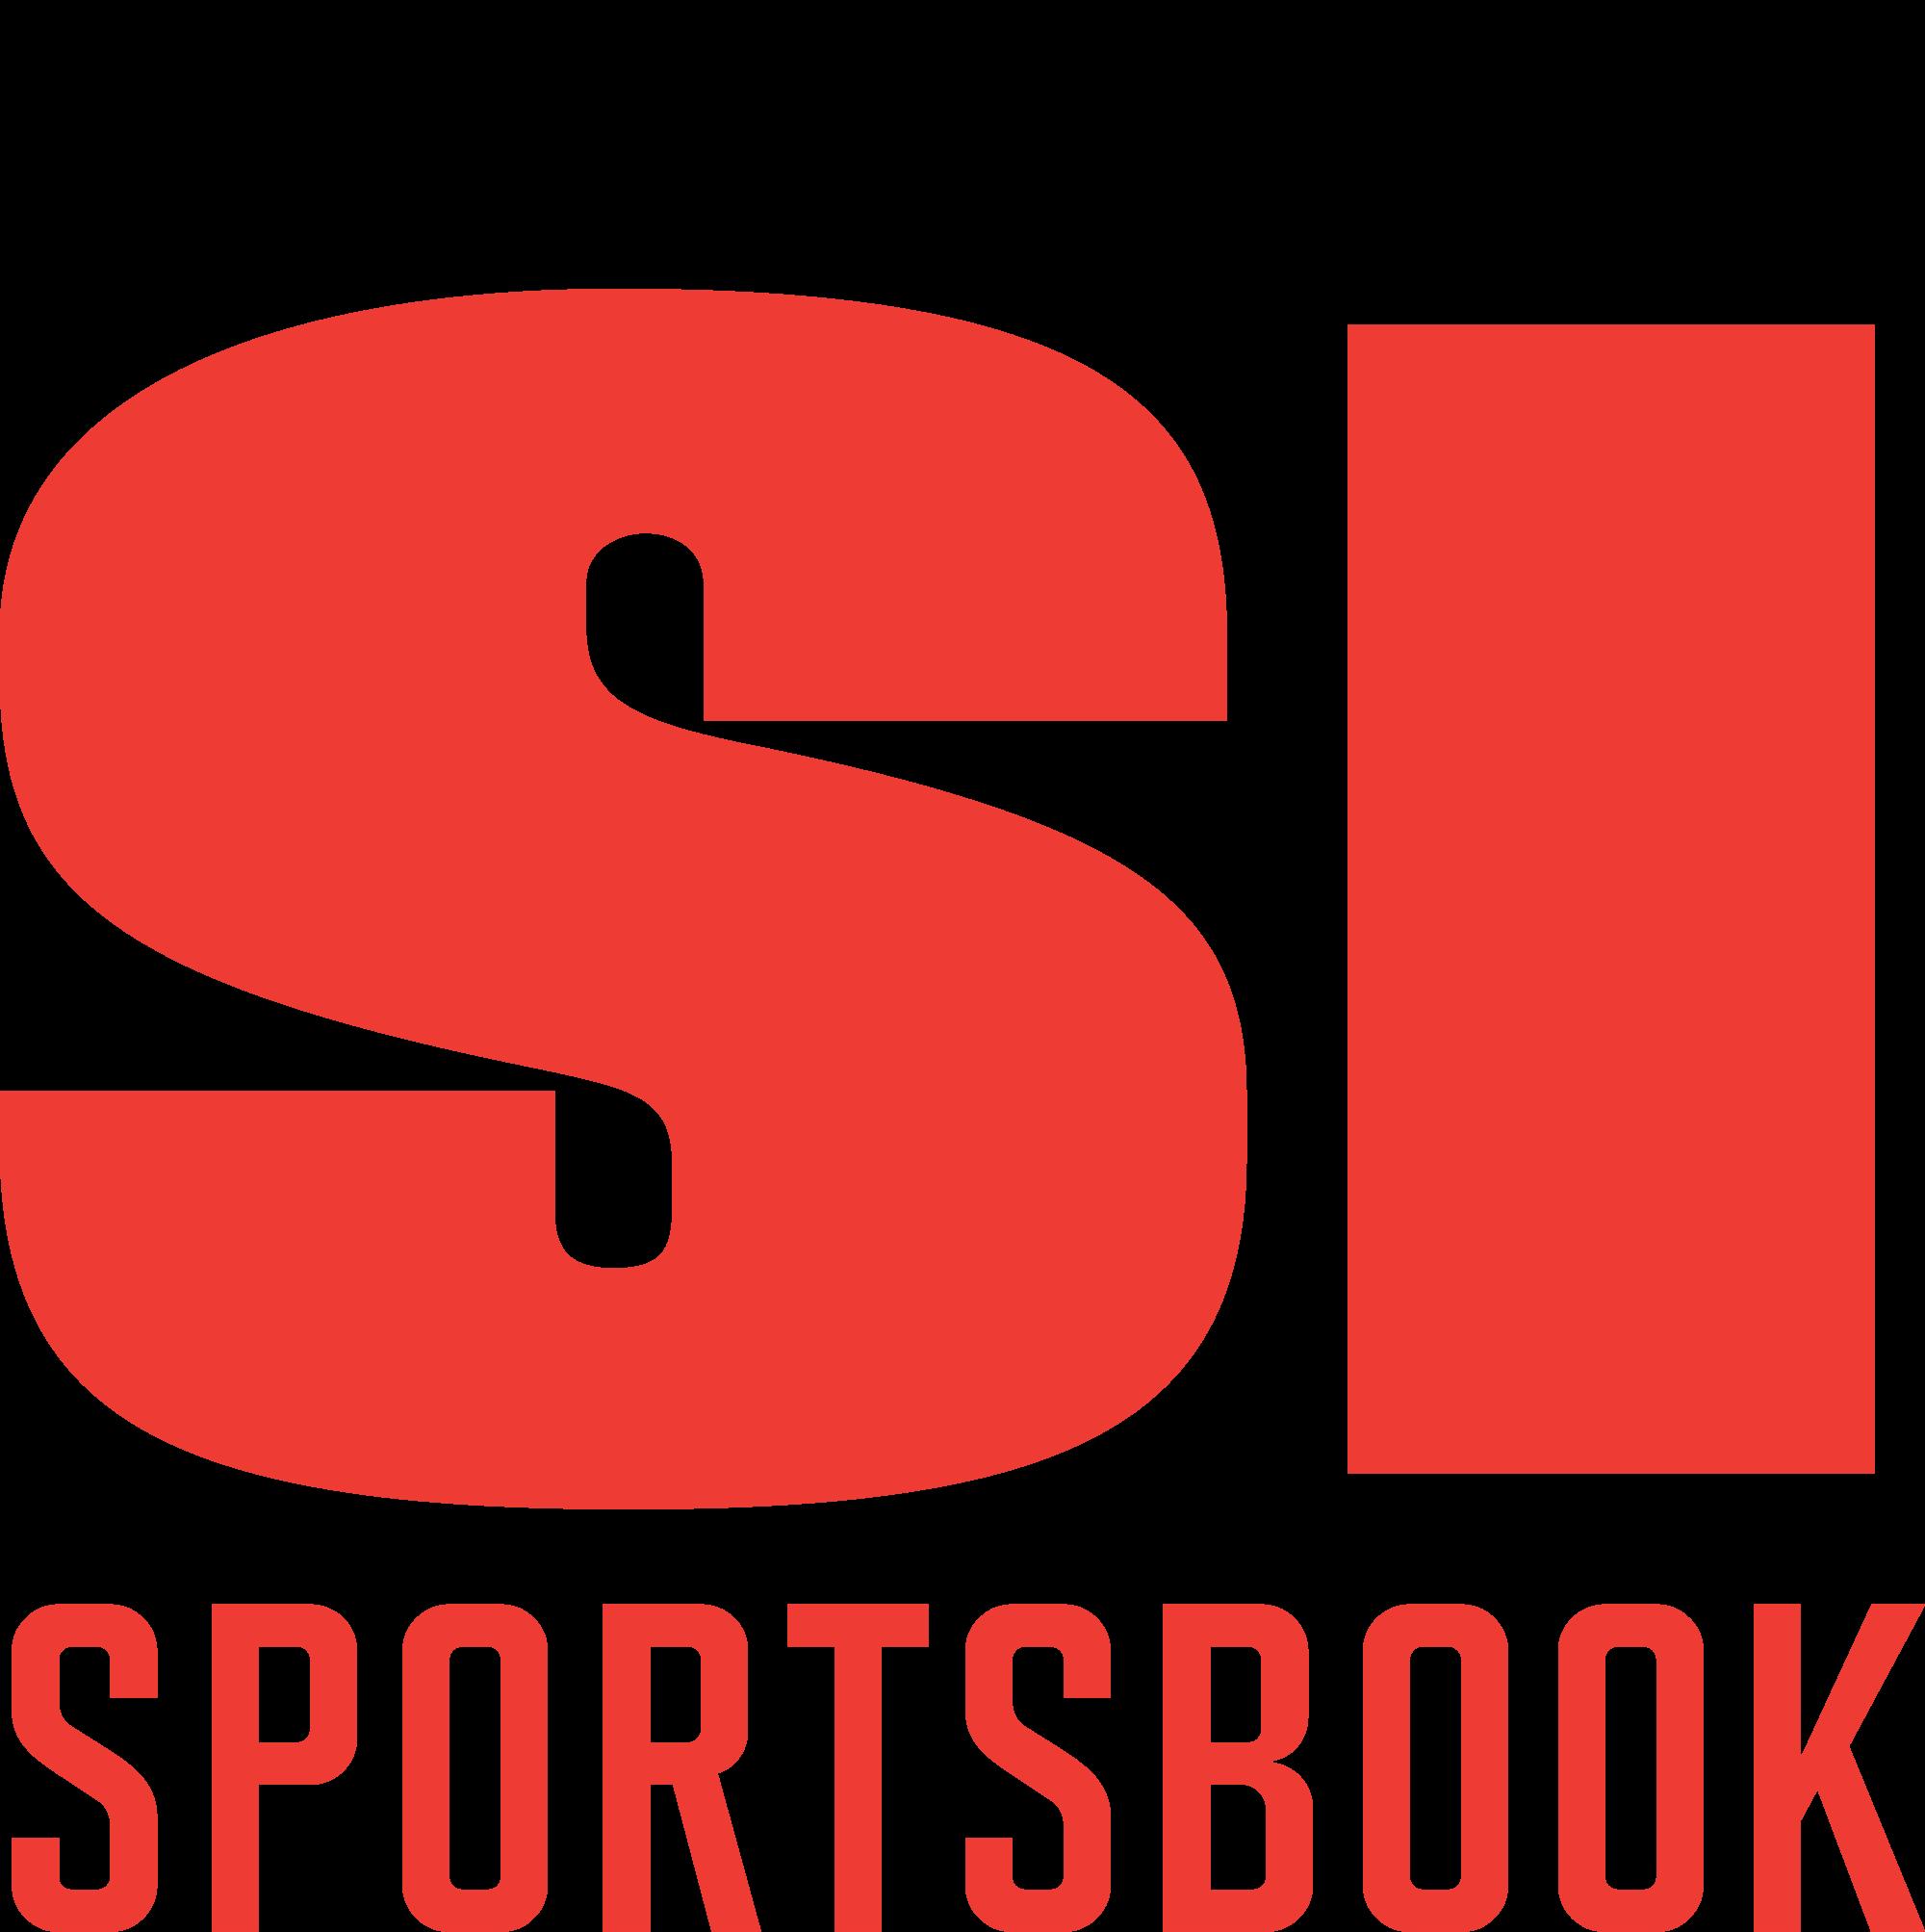 SI Sportsbook (Sports Illustrated)